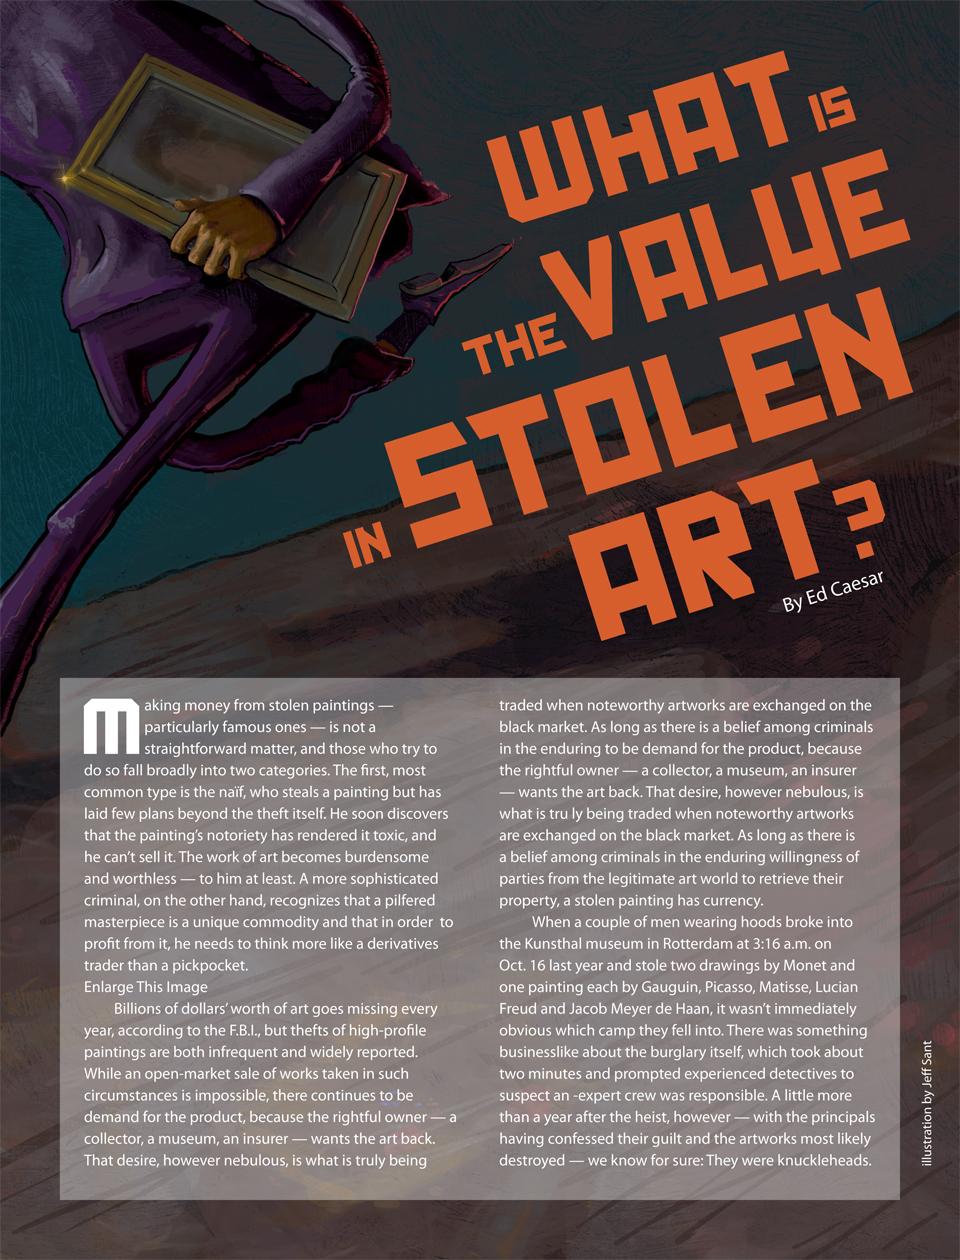 WEB sant value instolen art page layout.jpg